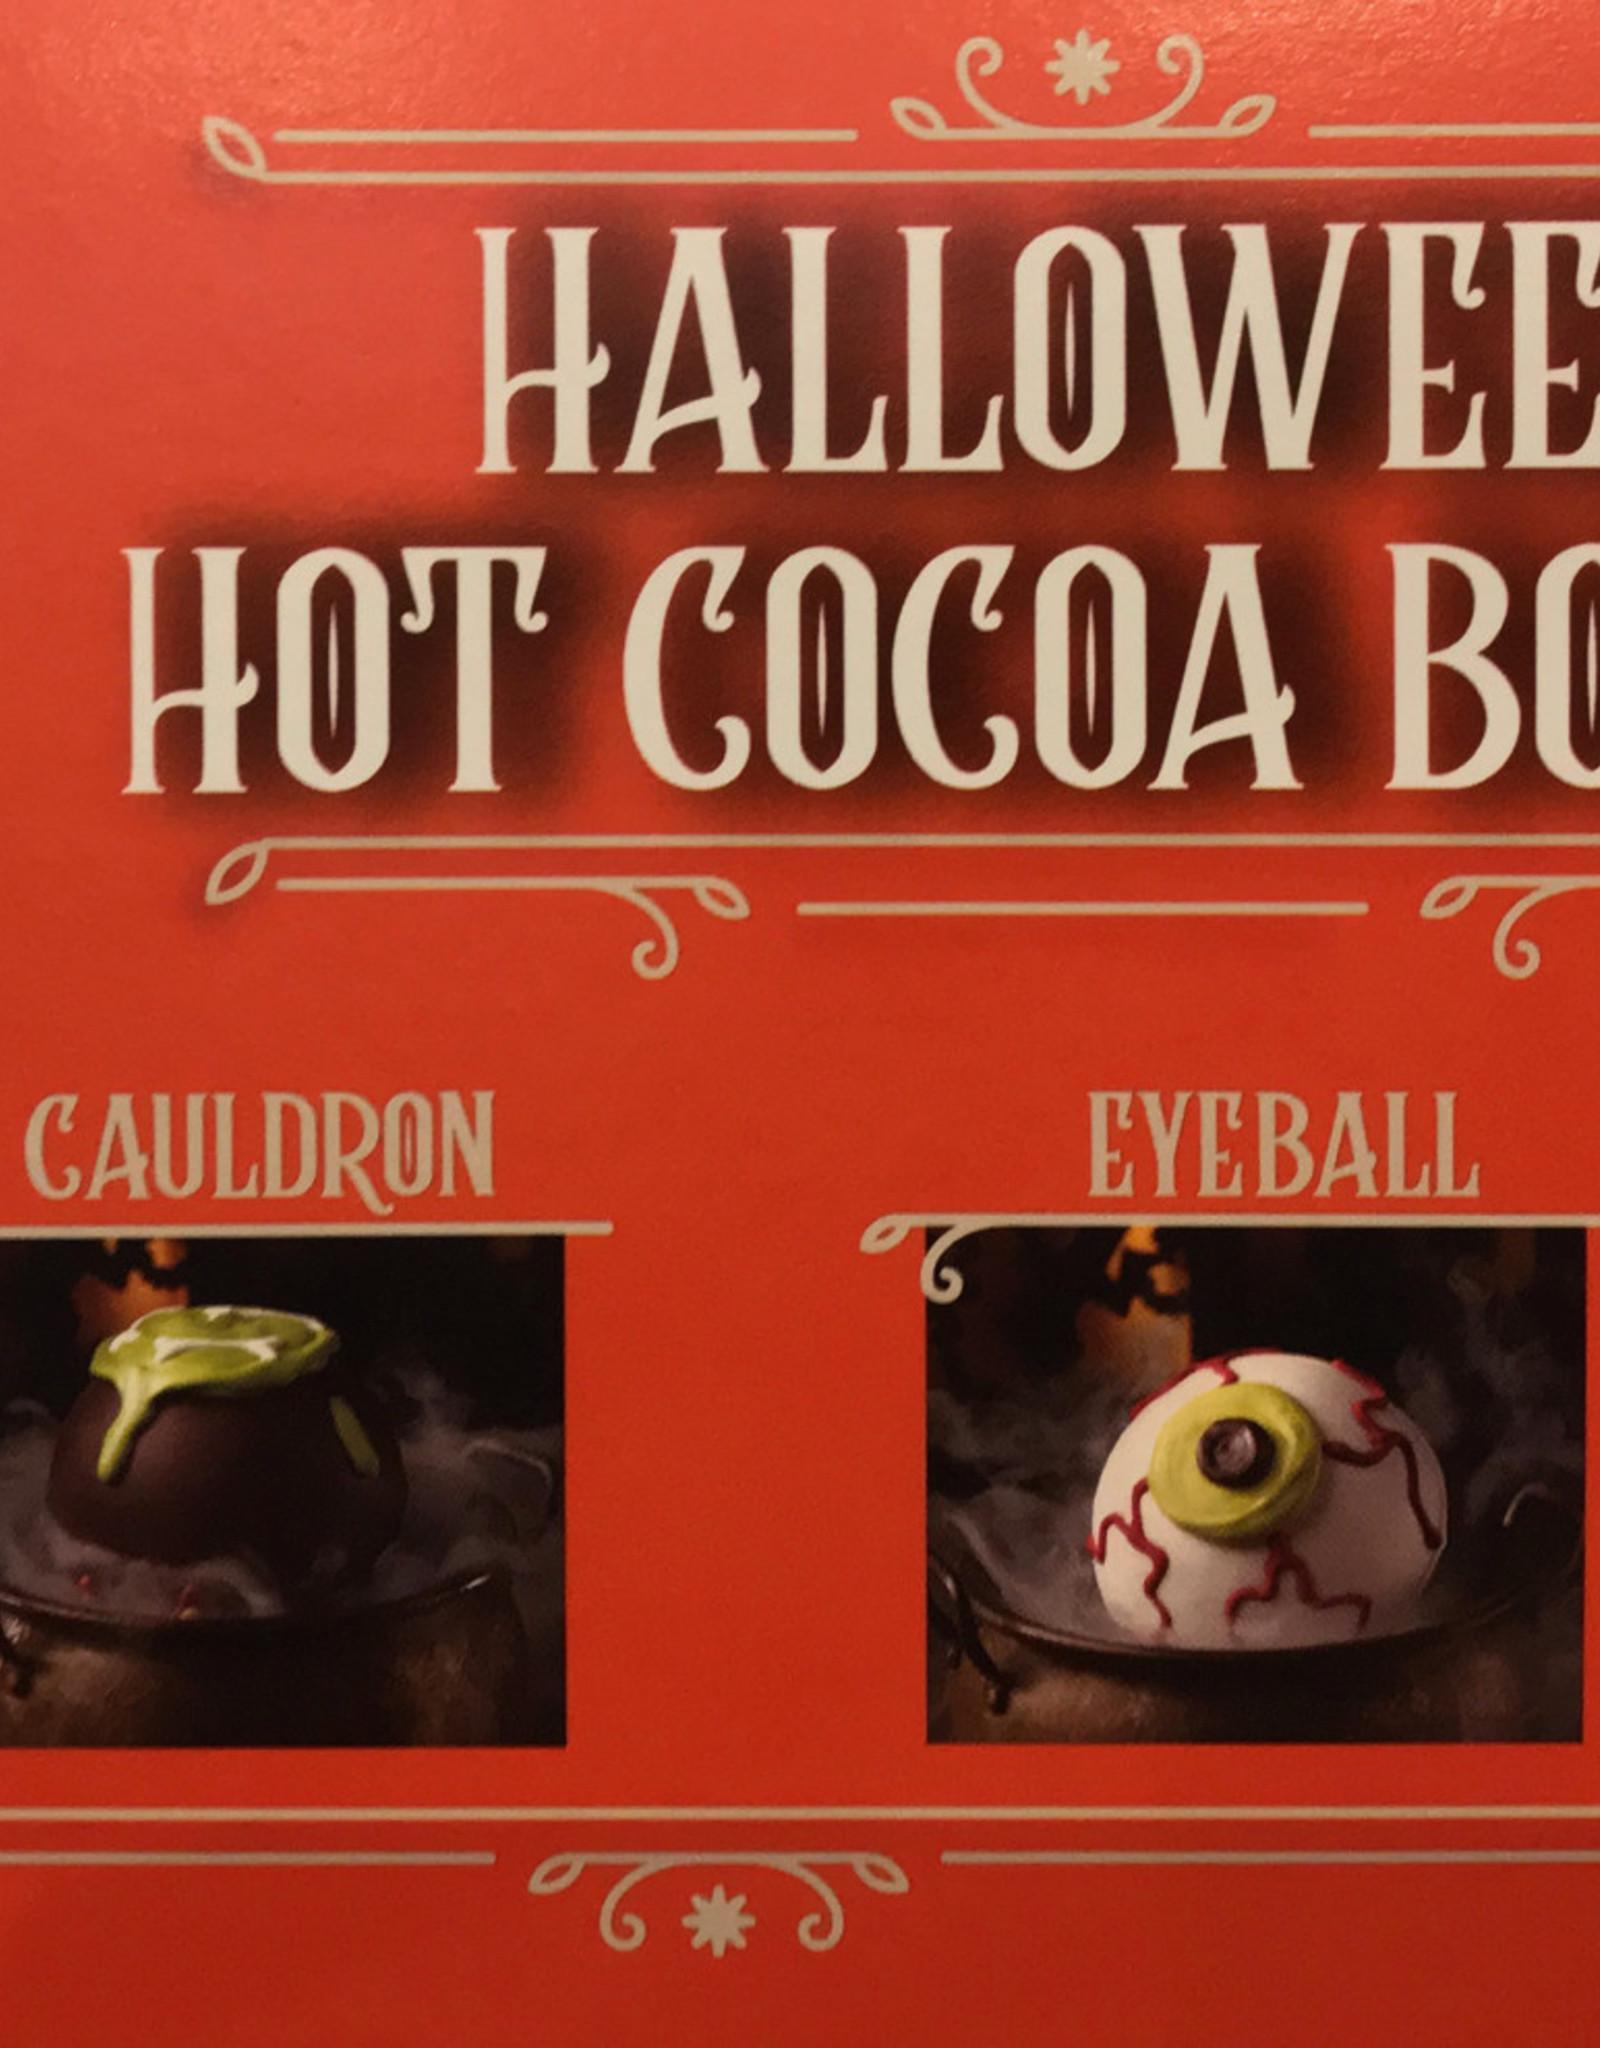 Hot Cocoa Bombs Halloween-4 pc